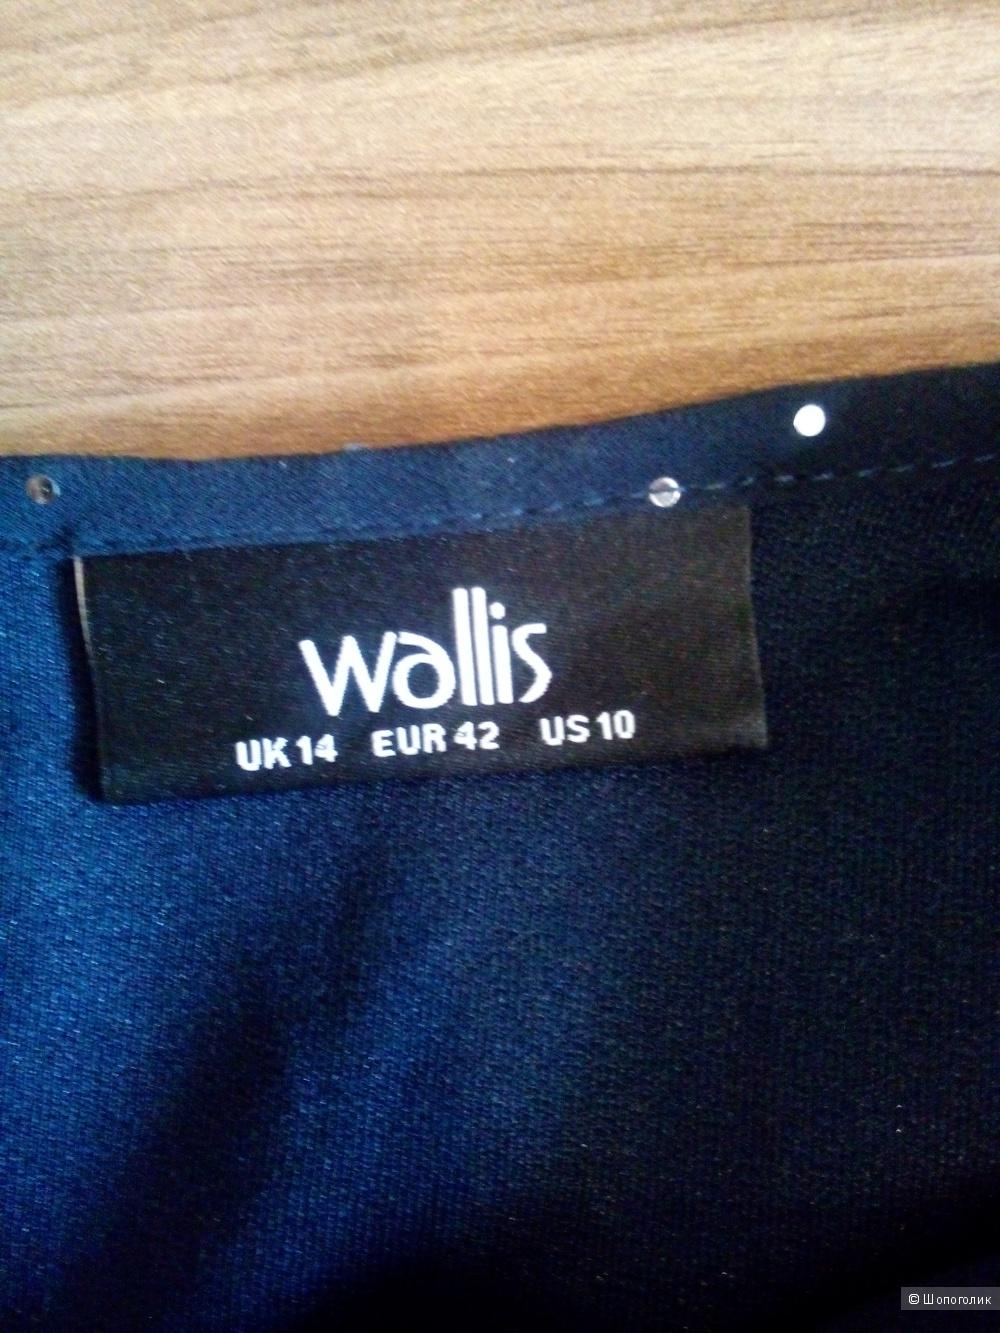 Блузка WALLIS Англия серо-дымчатого цвета в размере 14GB(46-48)